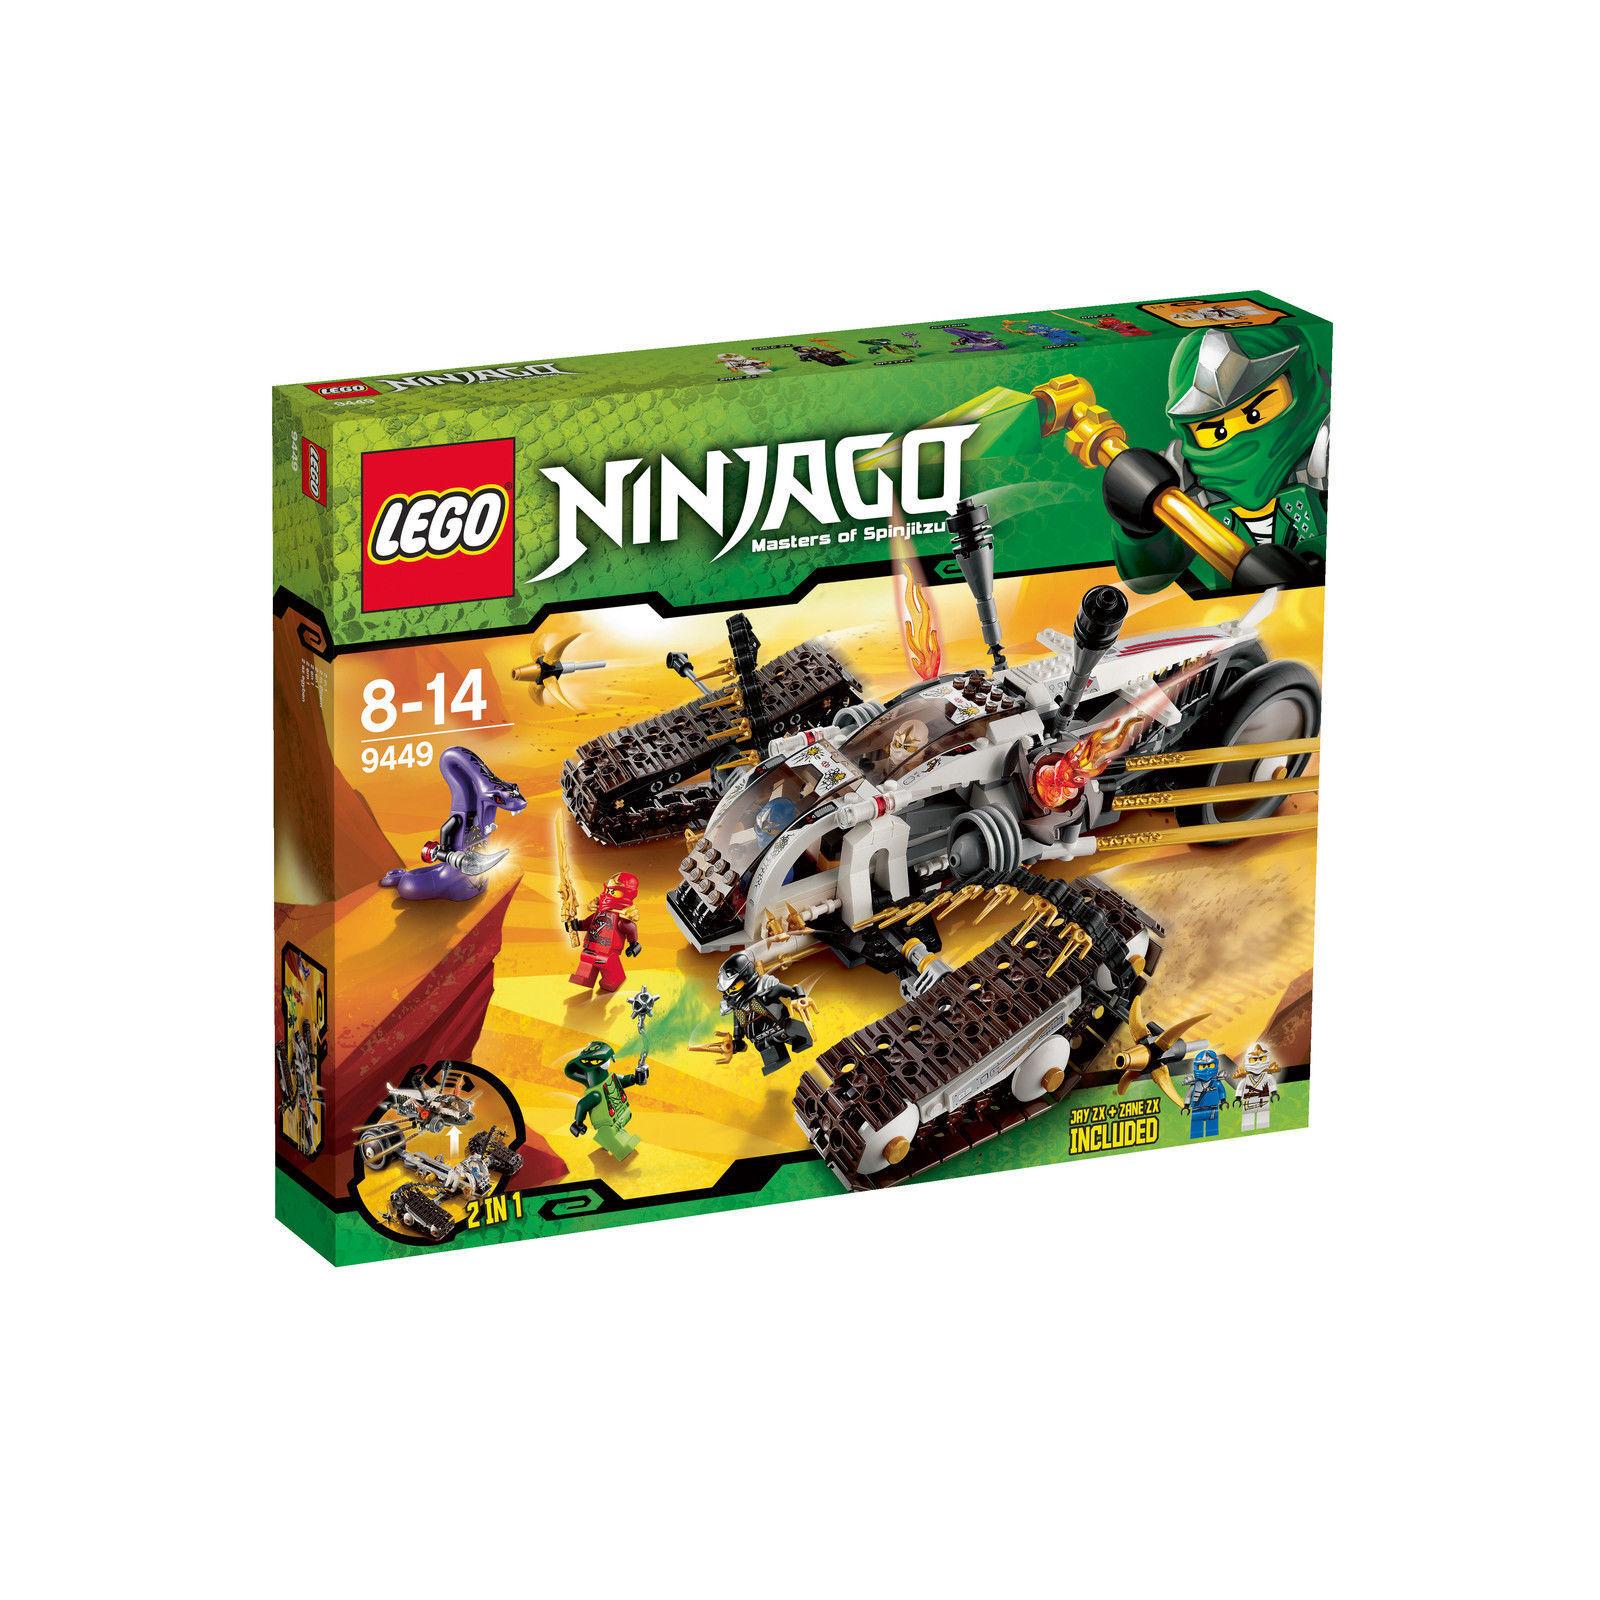 Lego Ninjago 9449 ultrallschall-Raider rareza nuevo embalaje original New